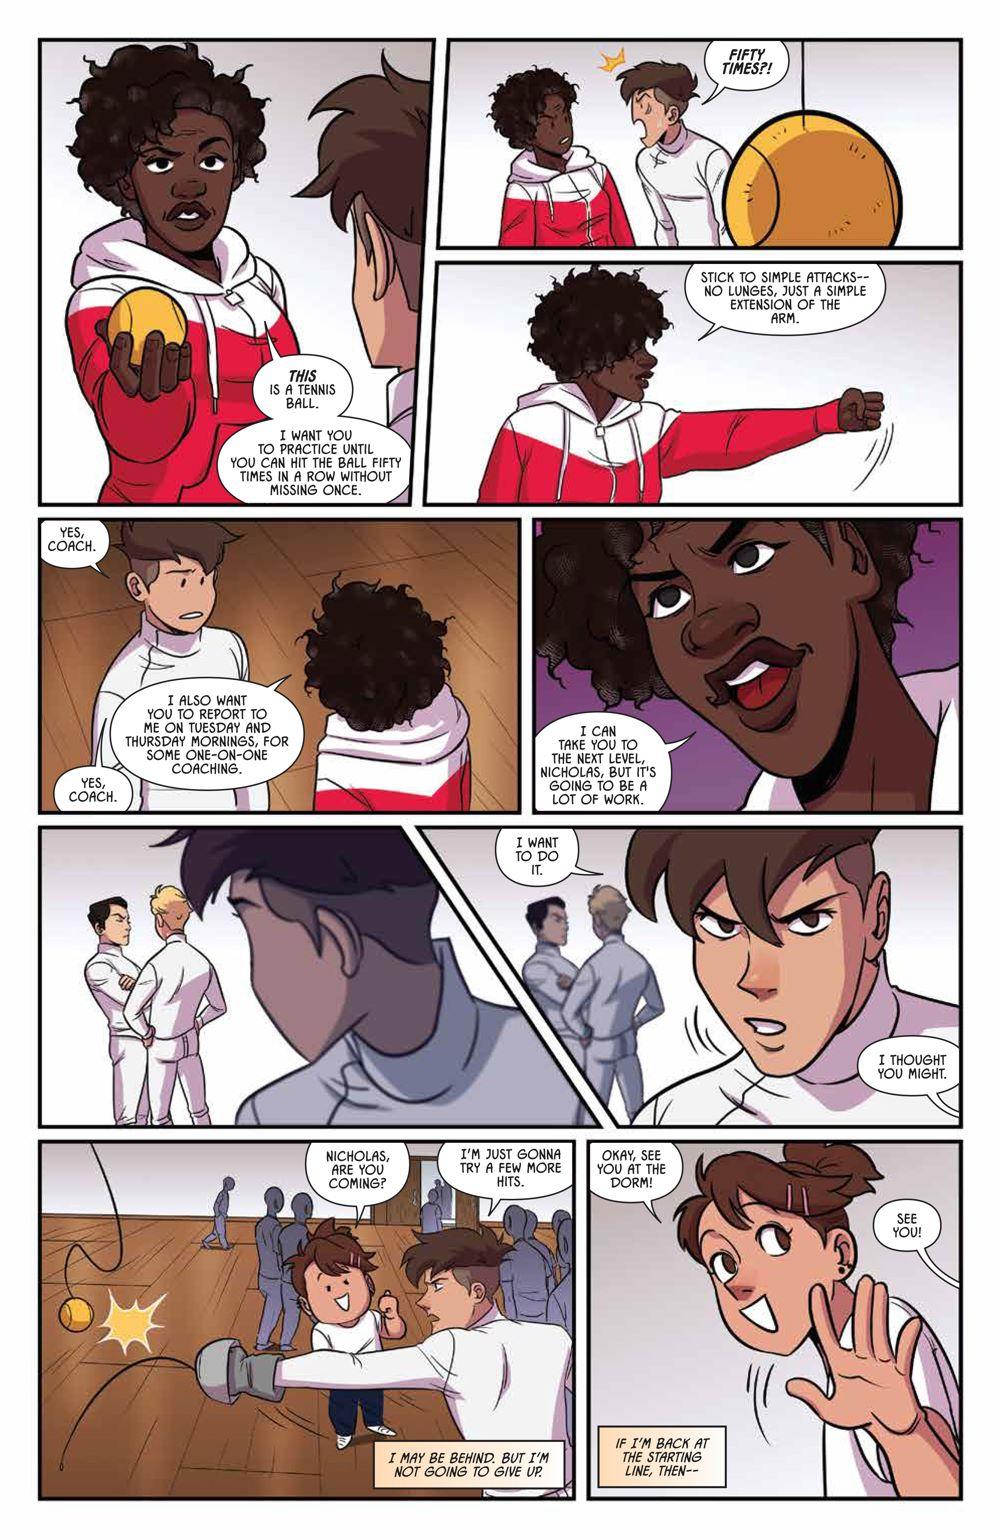 Fence_OGN_Rivals_SC_PRESS_19-1 ComicList Previews: FENCE RIVALS GN